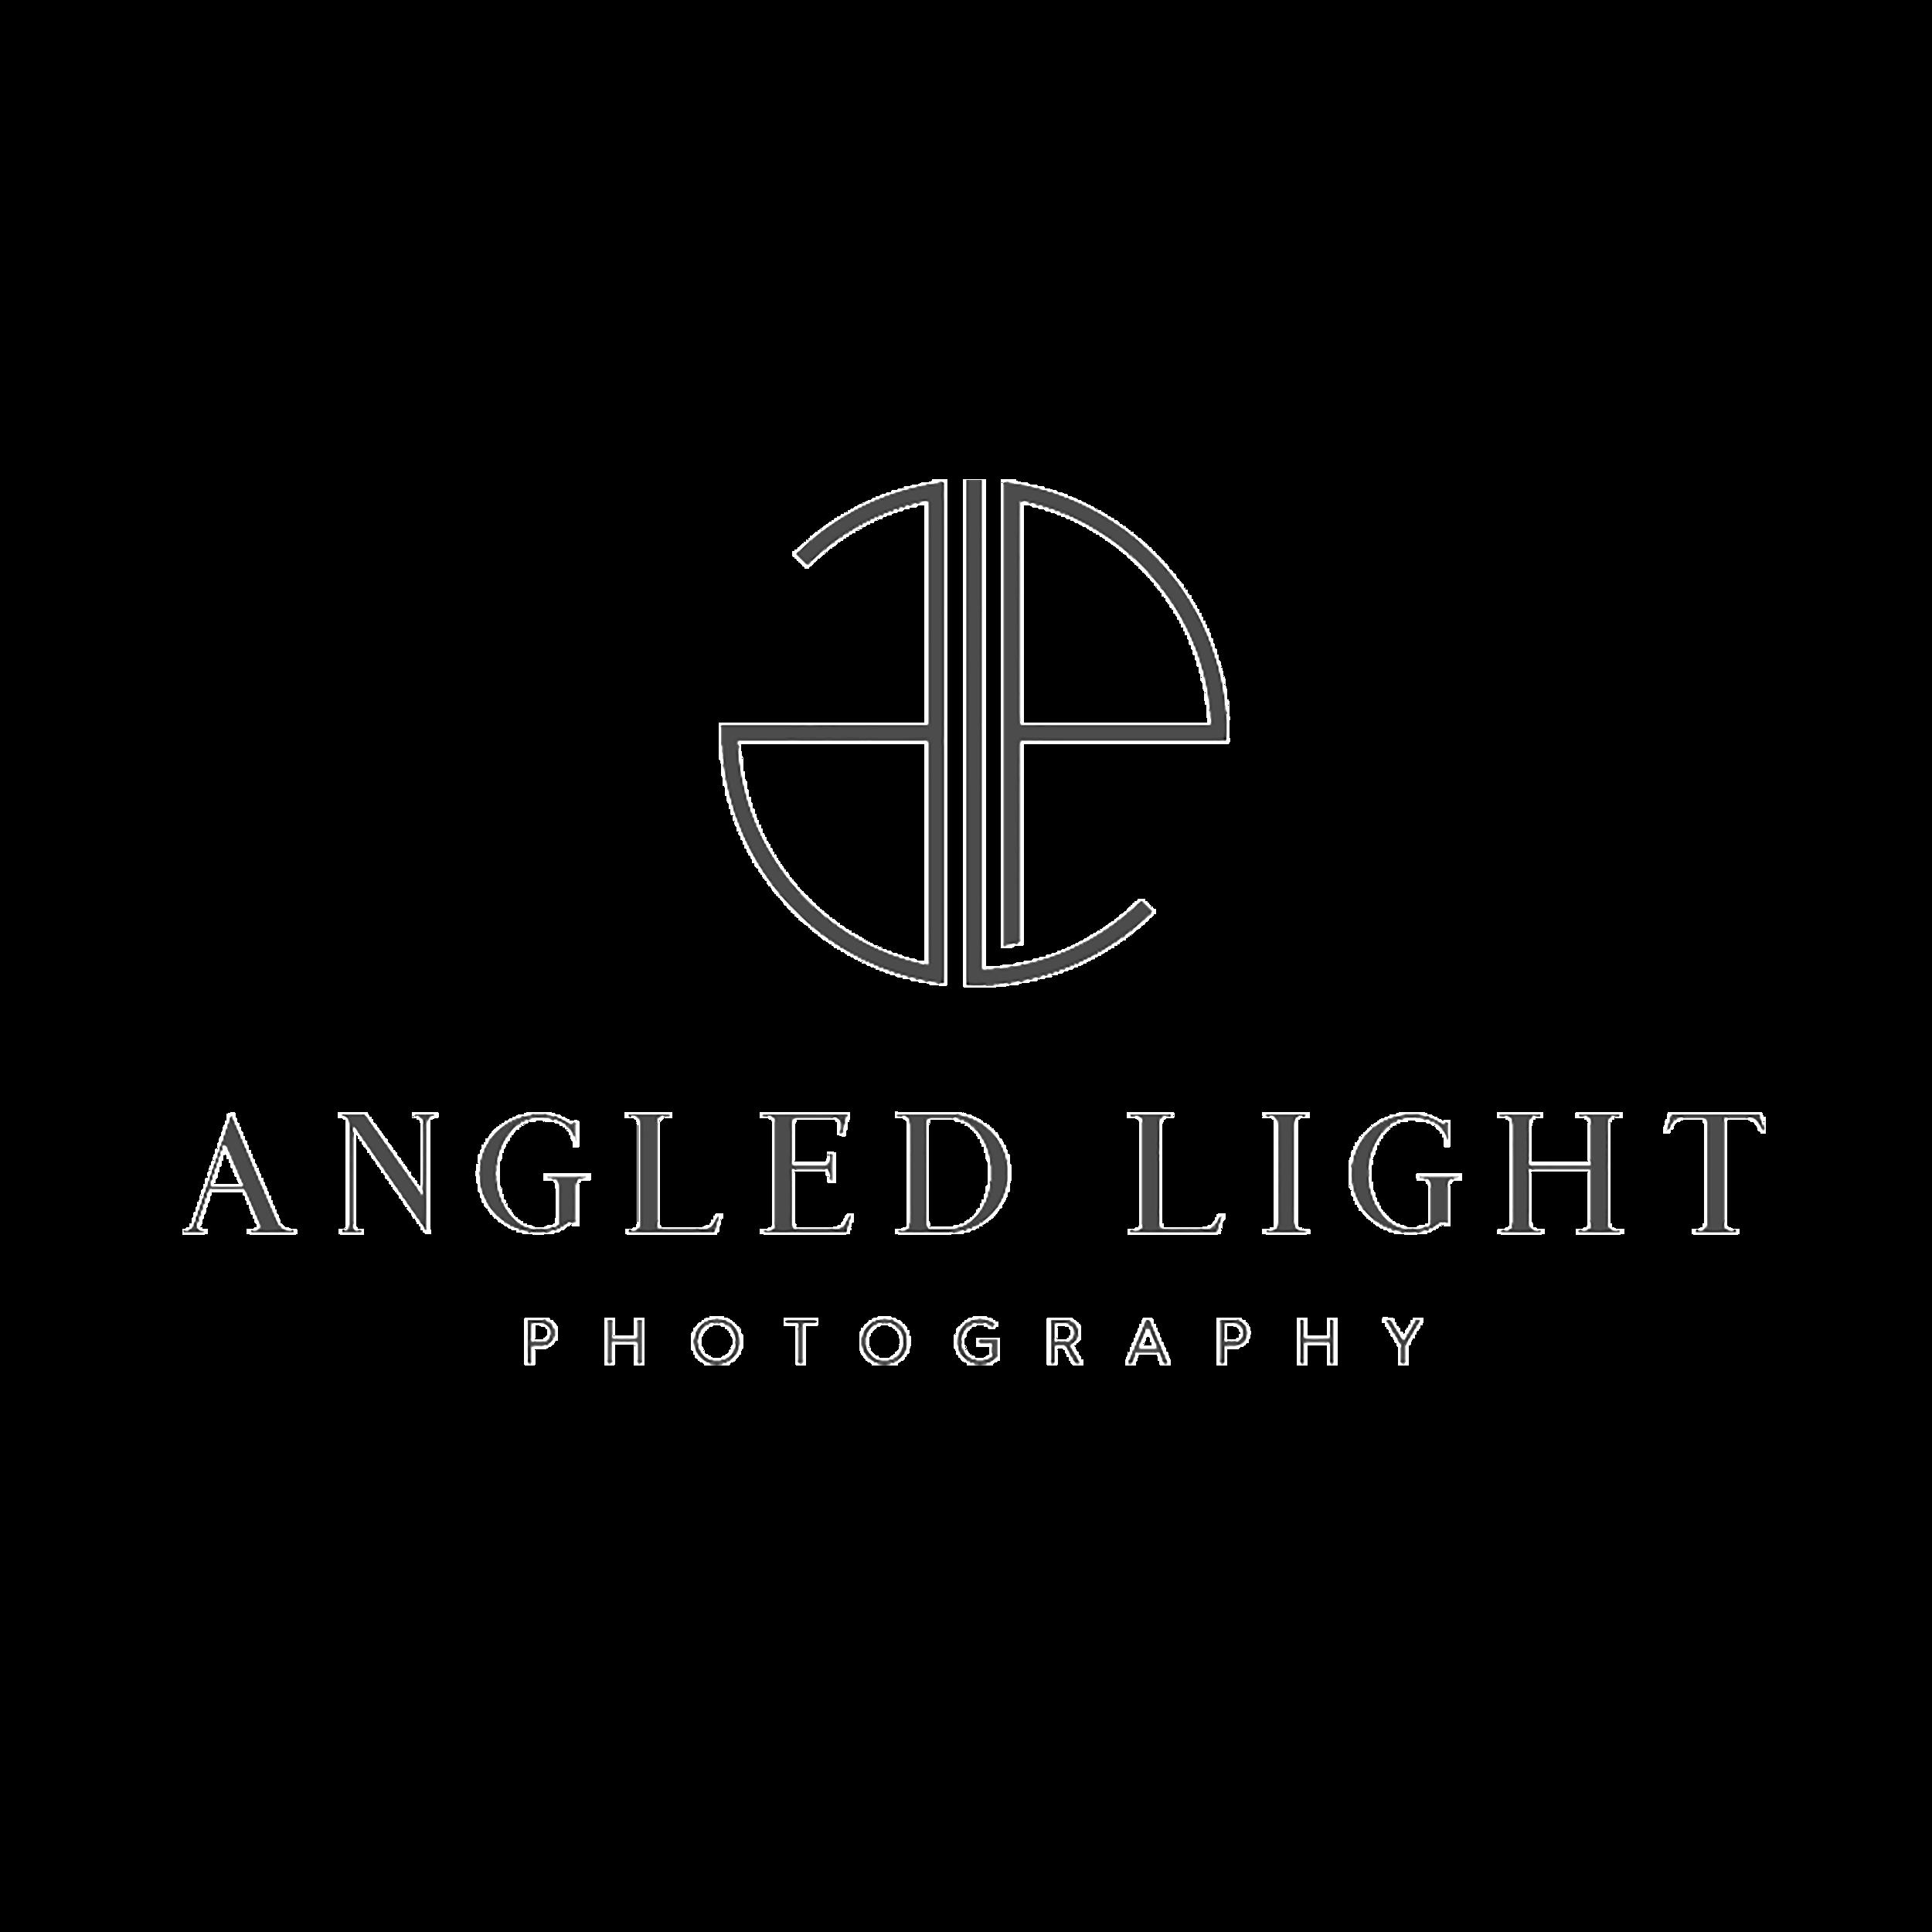 Angled Light Photography Logo